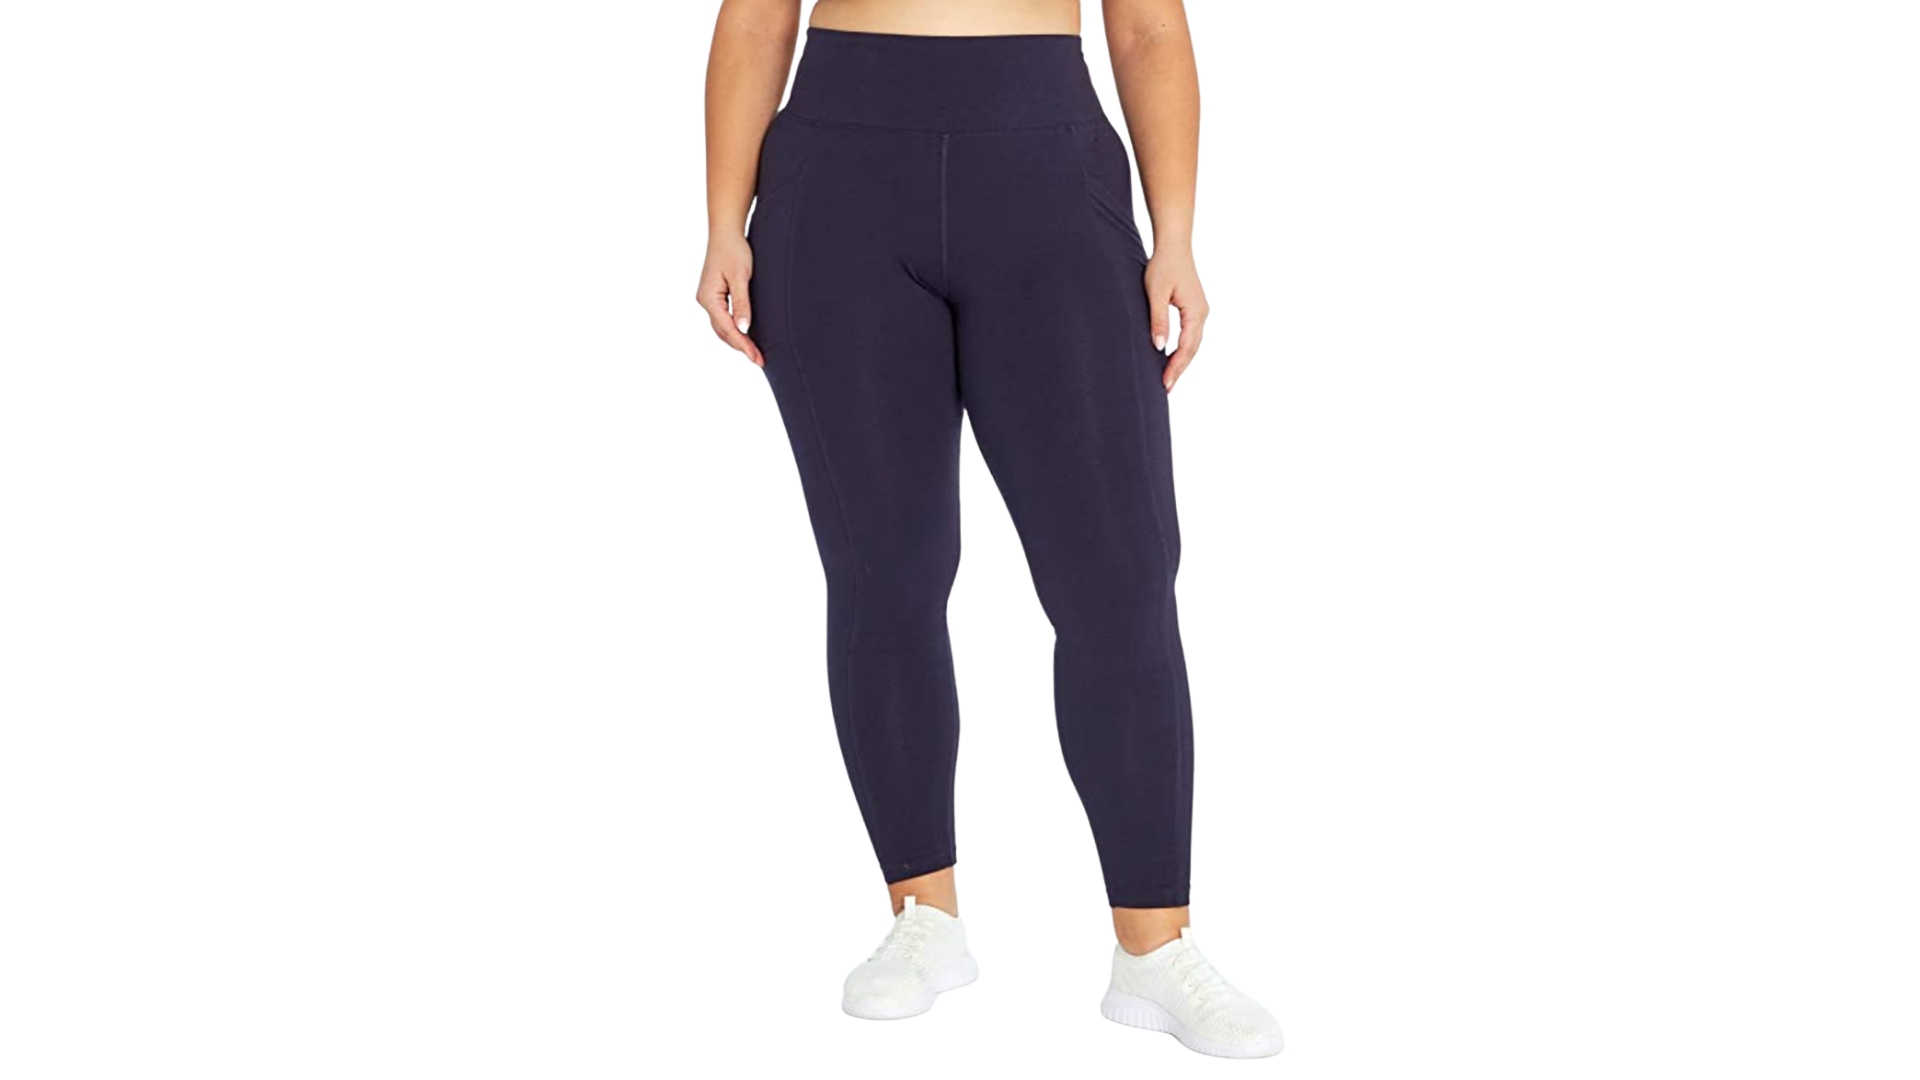 Marika best plus size leggings with pockets